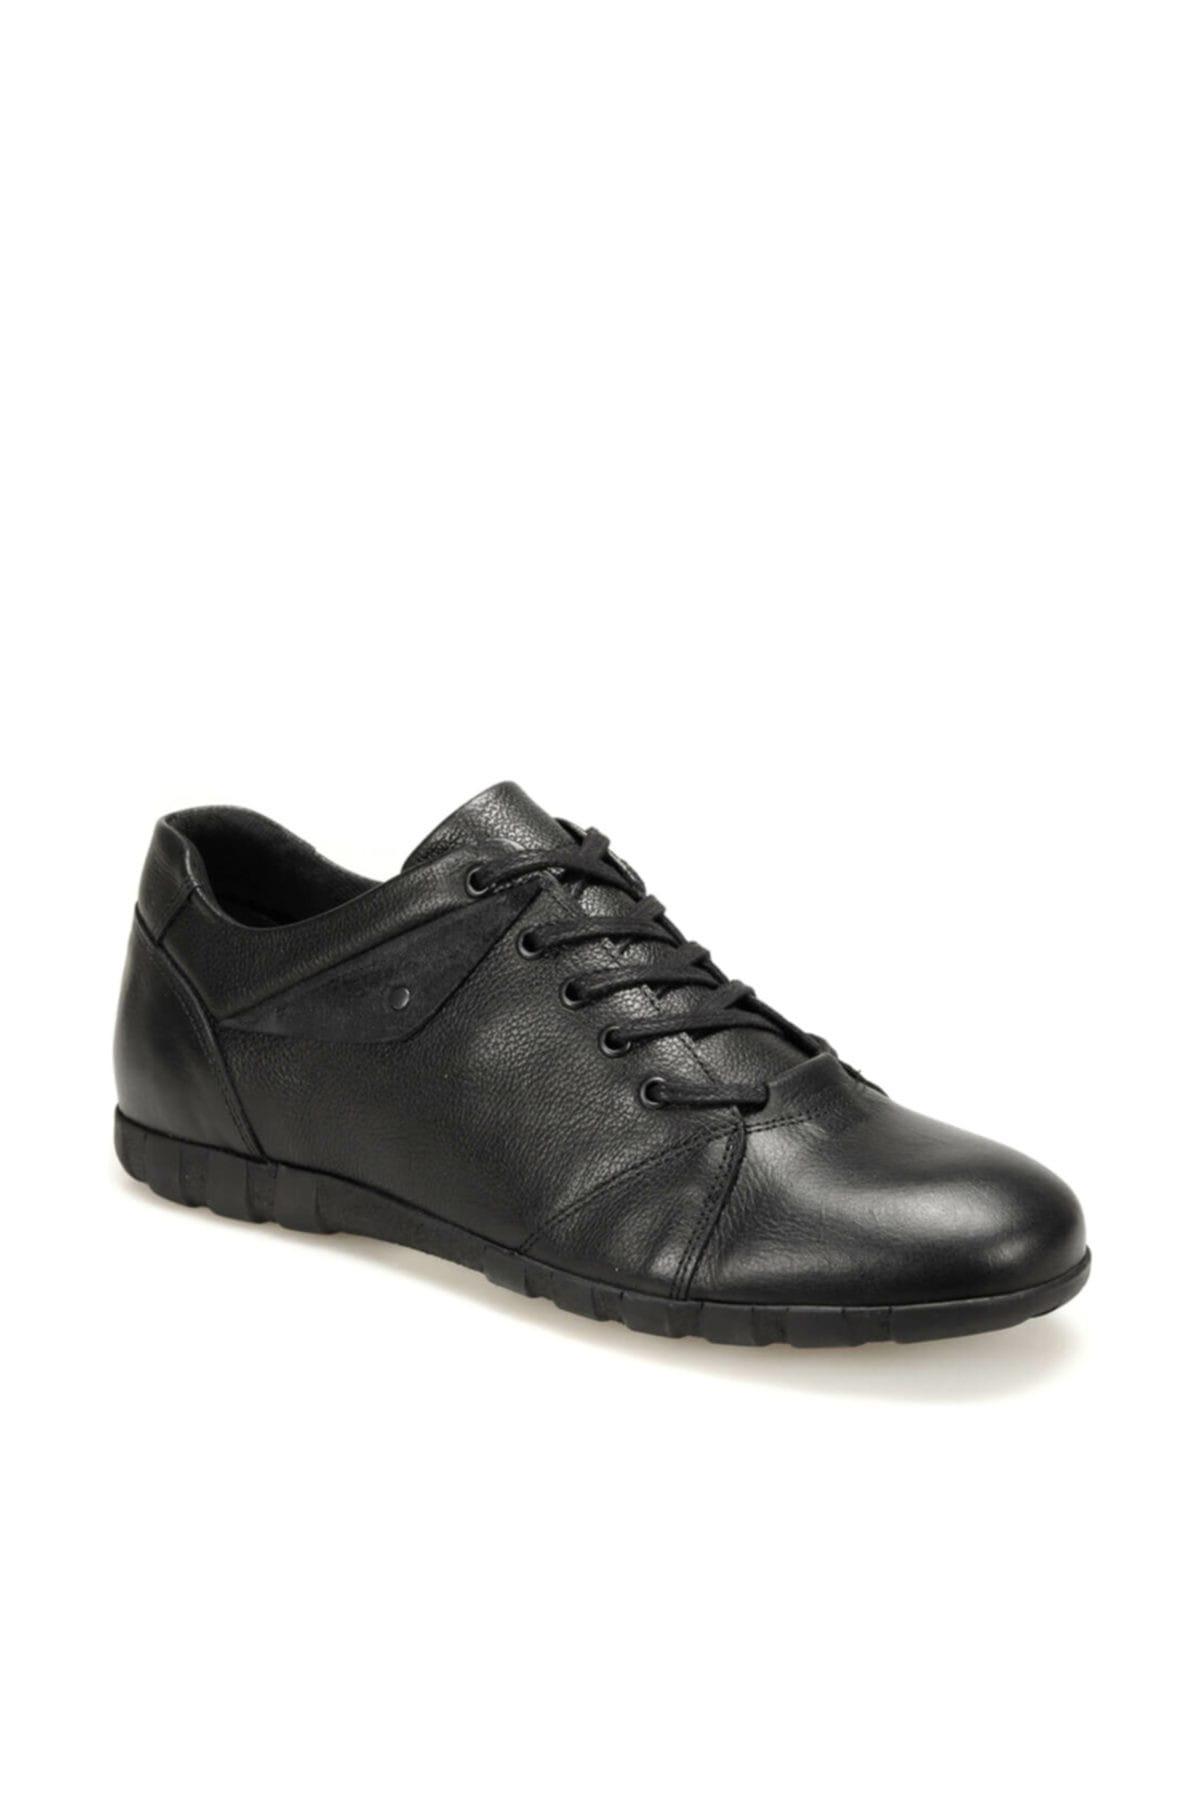 OXIDE NHT-01 Siyah Erkek Casual Ayakkabı 100398596 1